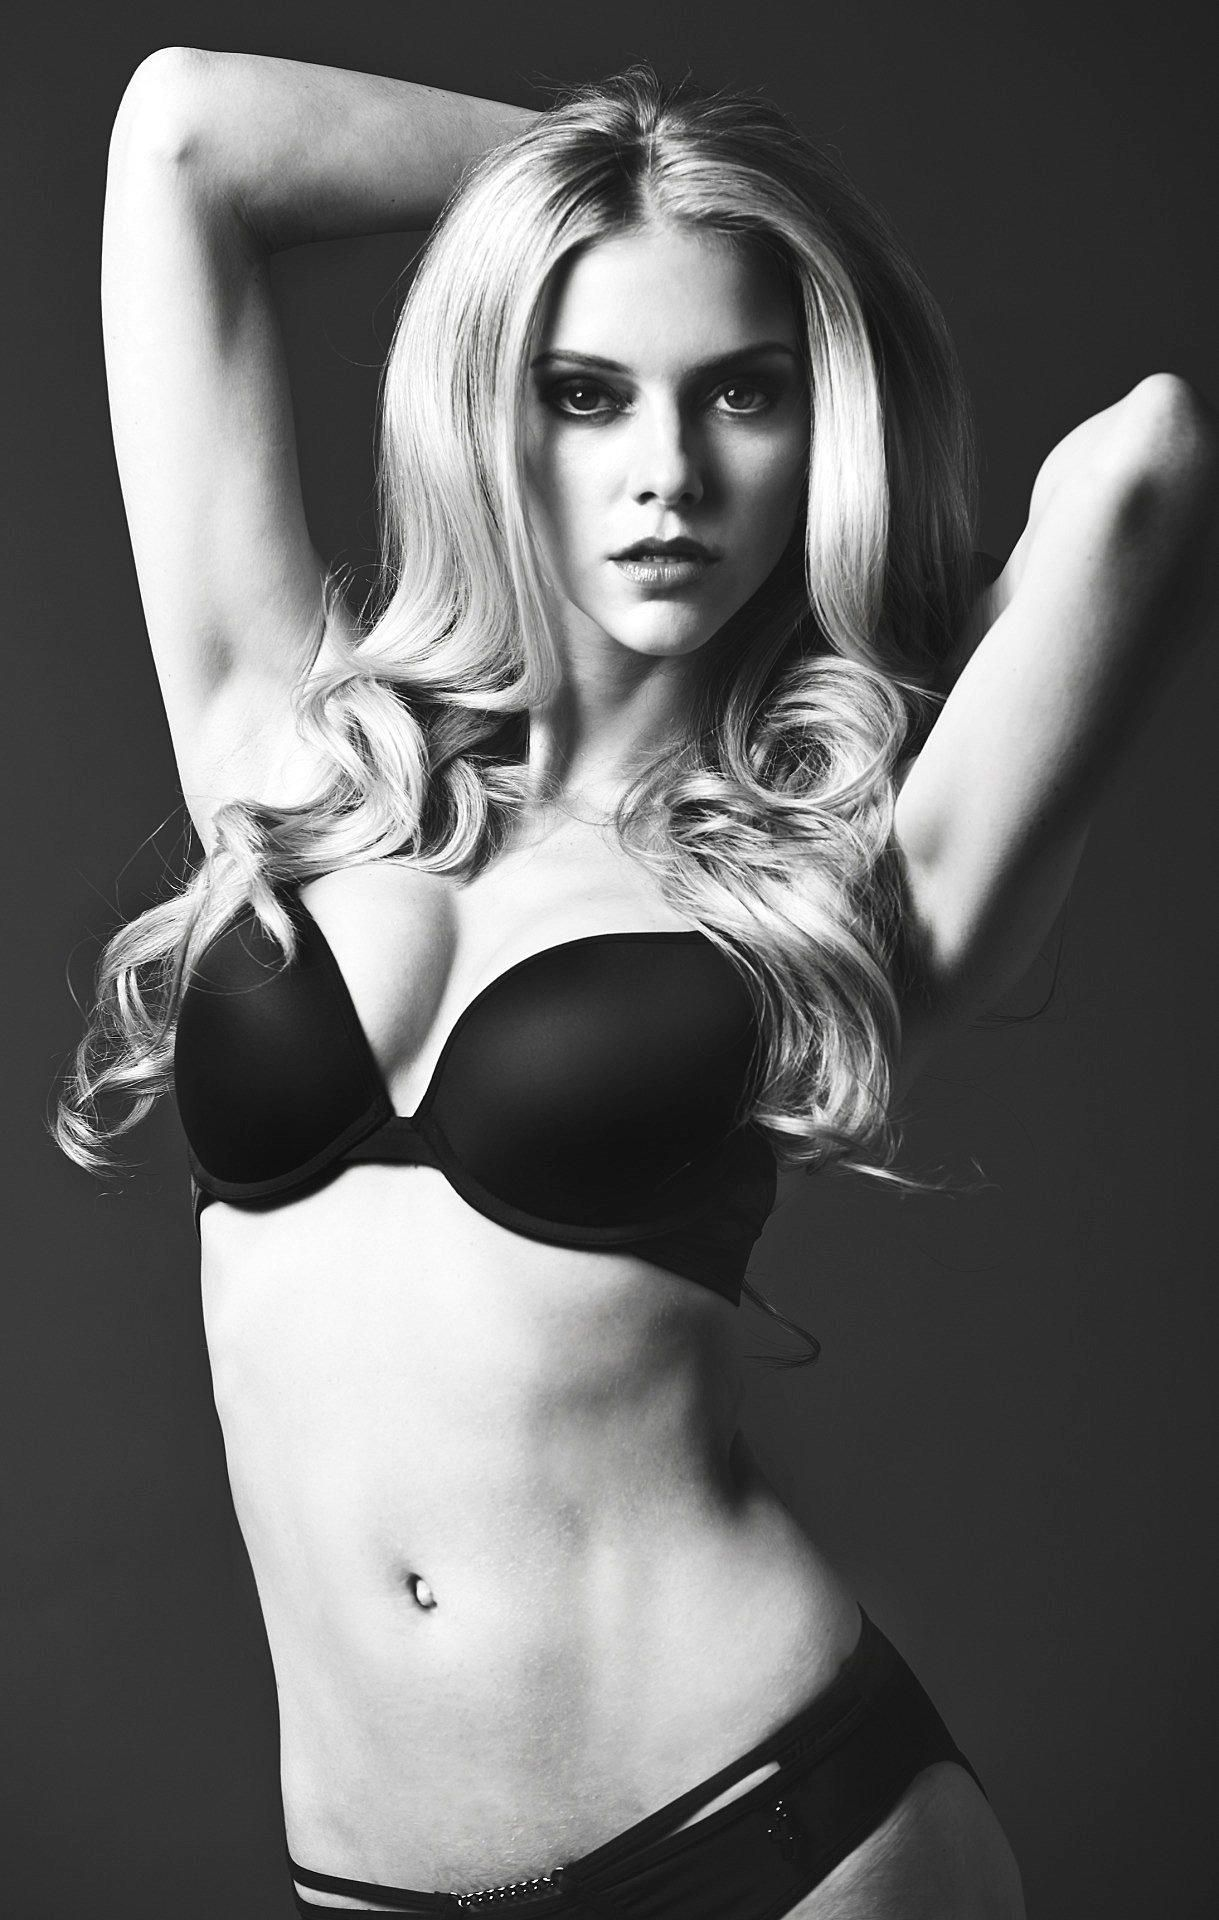 Elle-Evans-Sexy-1